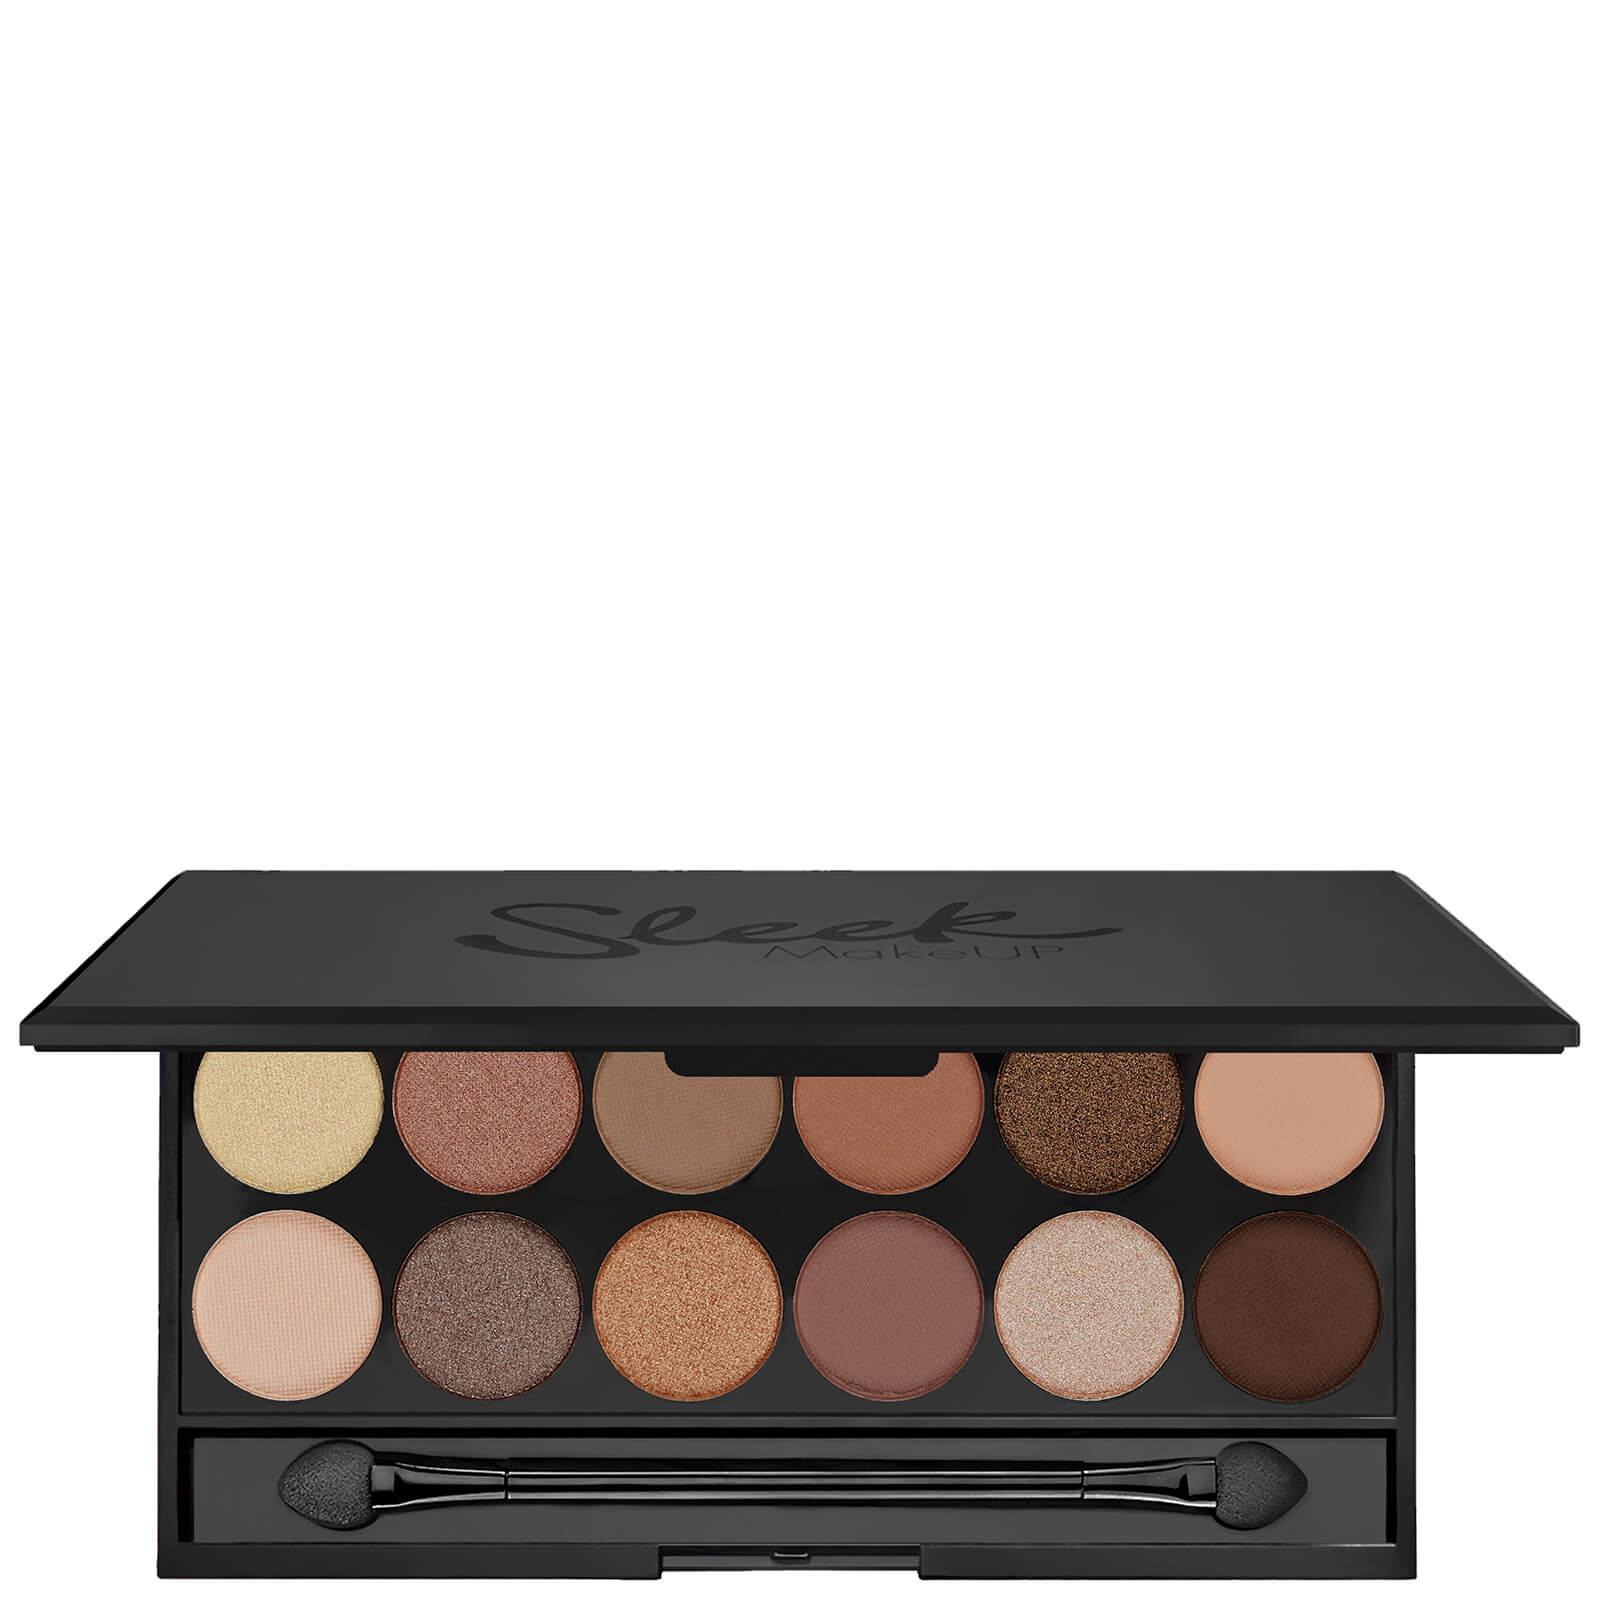 Купить Палетка теней для век Sleek MakeUP I-Divine Palette - A New Day 13, 2 г